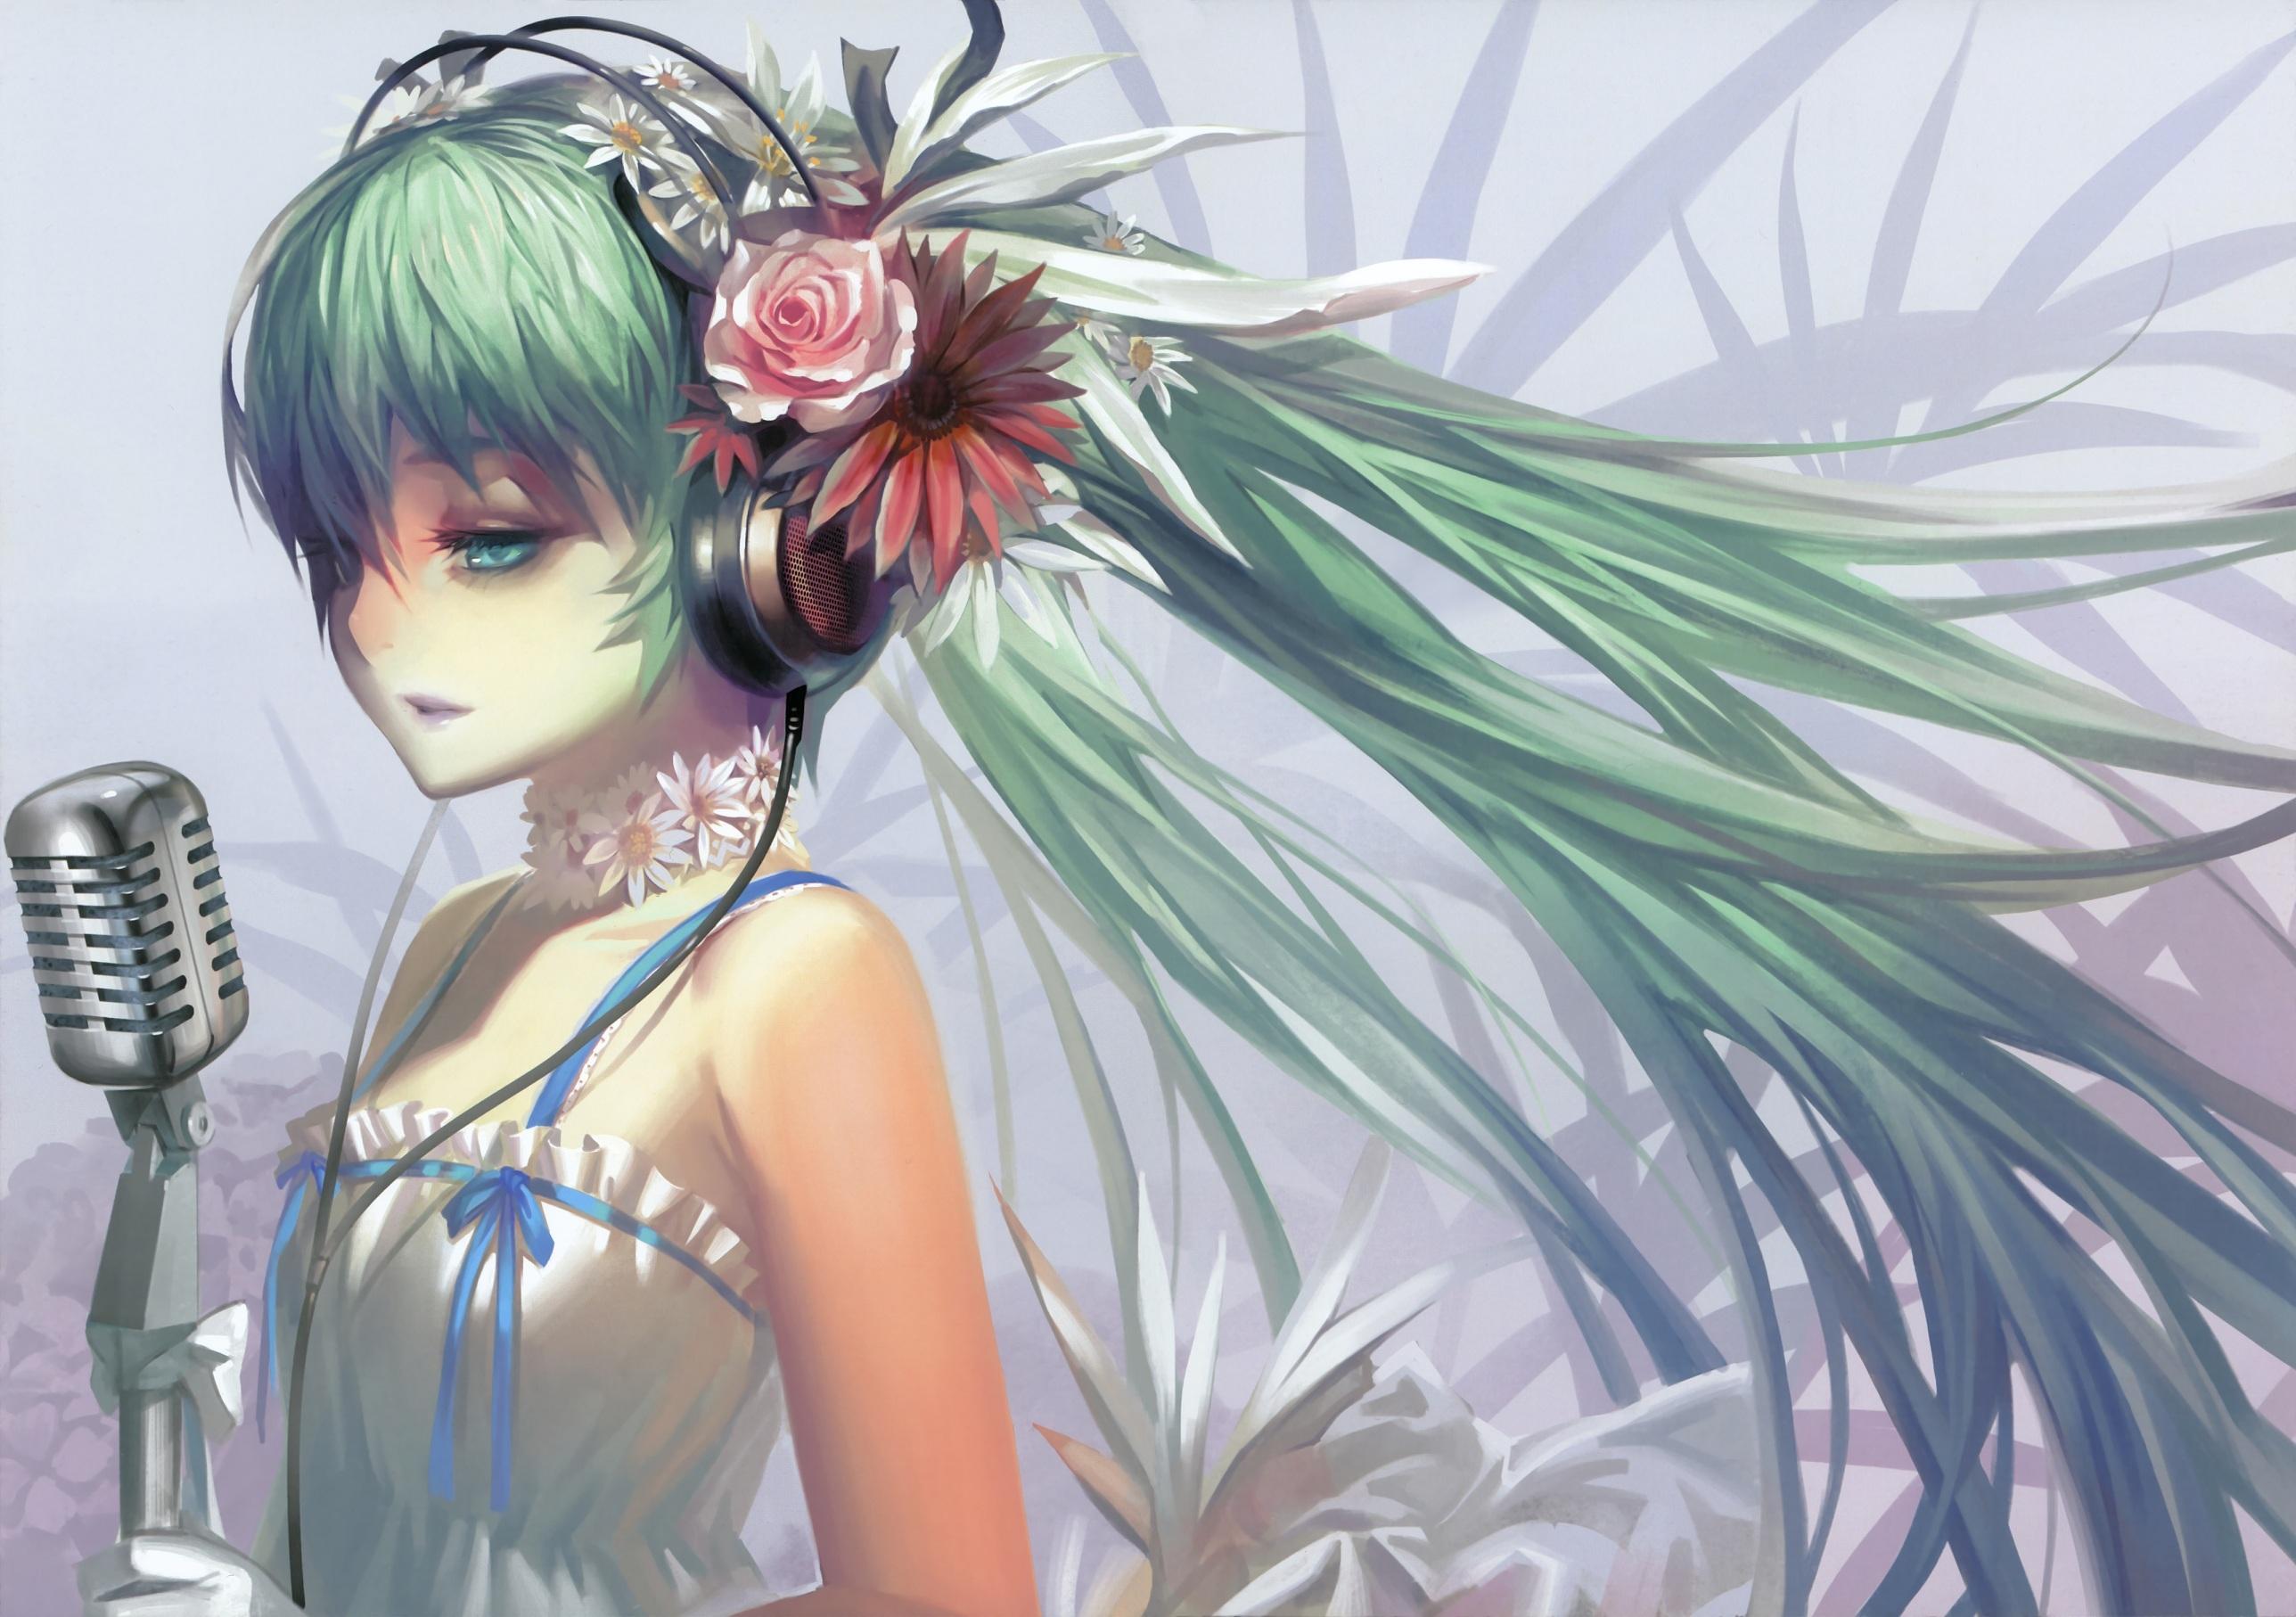 Vocaloid, Hatsune, Miku, Wallpaper, вокалоид, Хатсуне, Мику, обои, на, рабочий, стол, скачать, бесплатно, Wallpapers